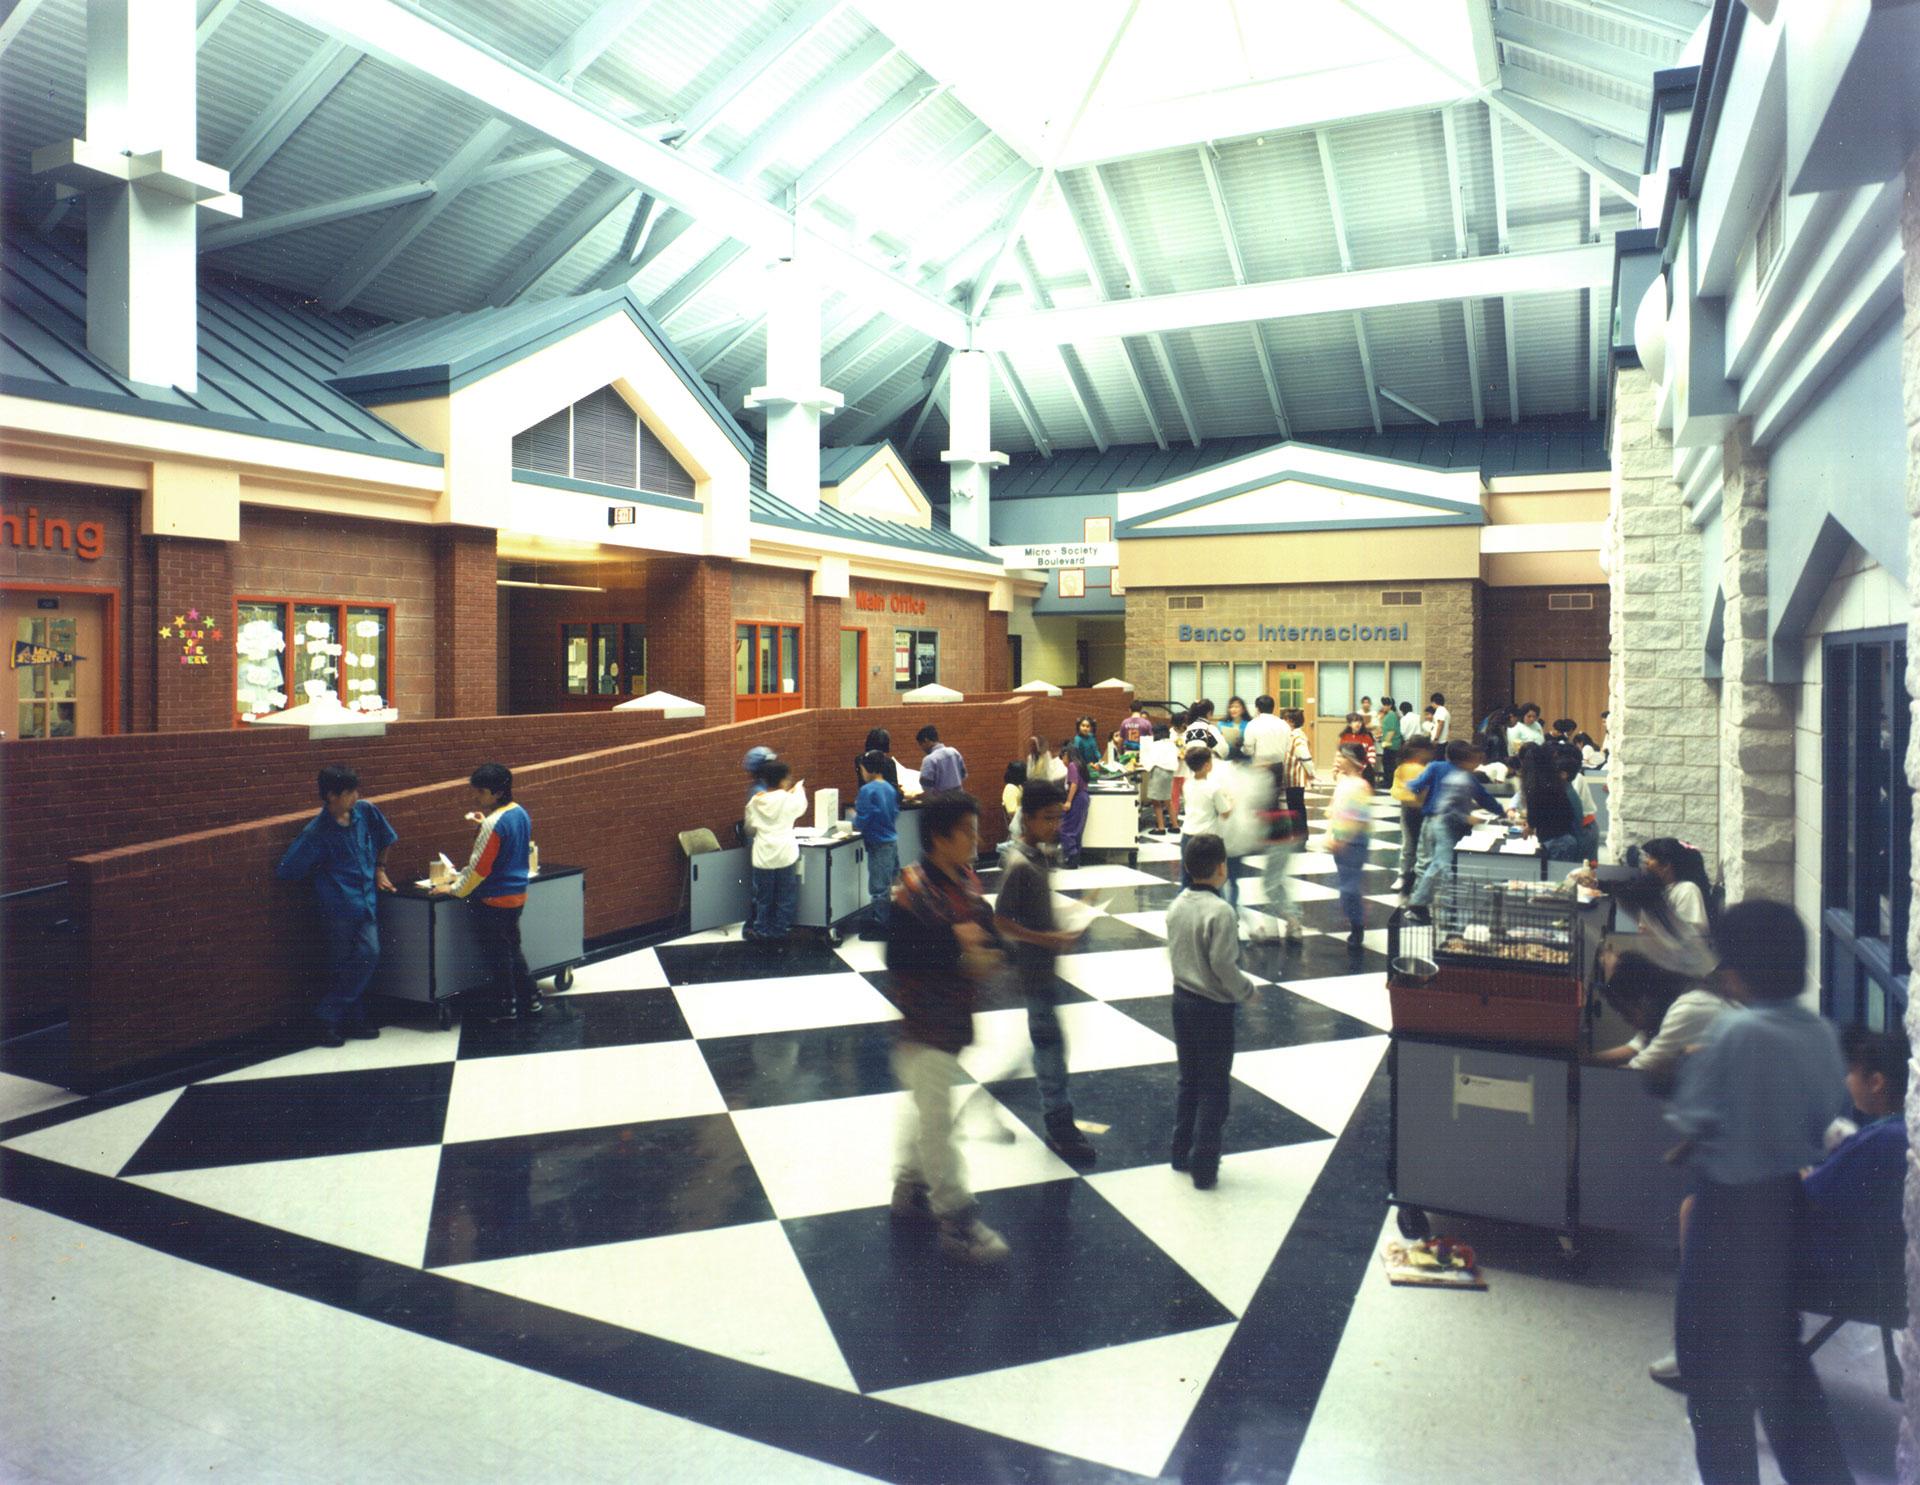 Banco Internacional at the Yonkers Microsociety